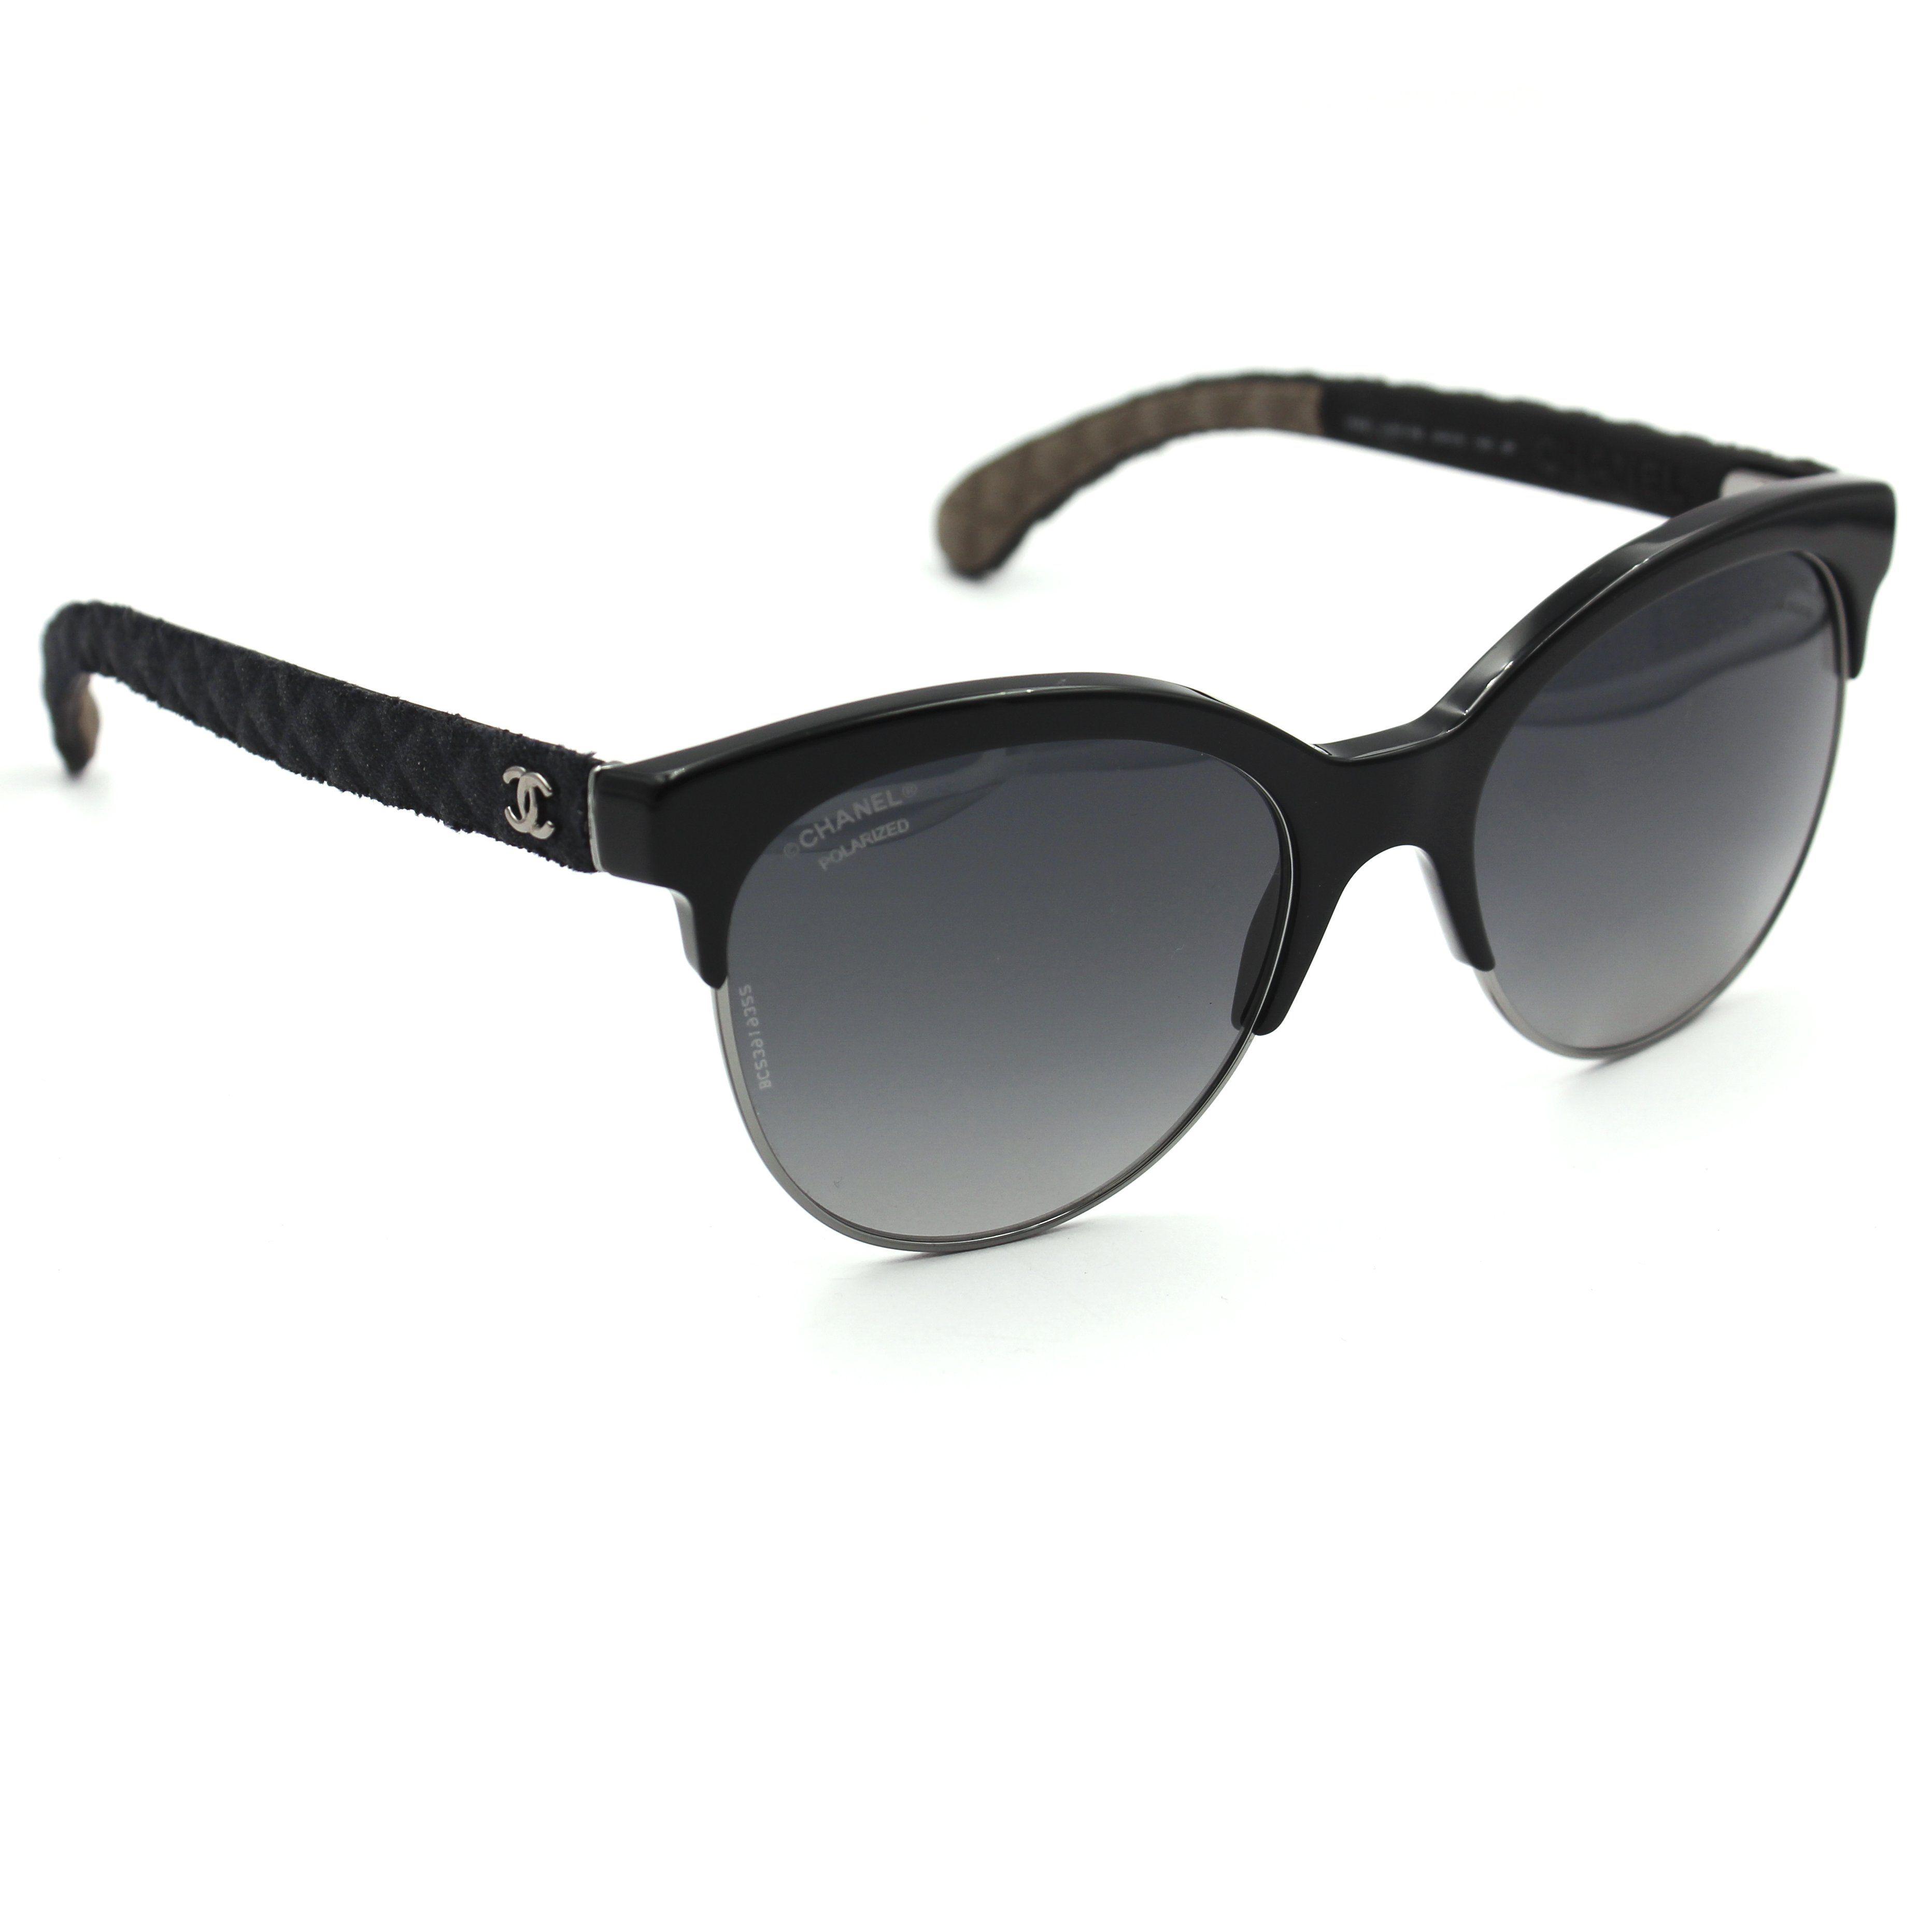 809a58cec25 Chanel 5342 Pantos Sunglasses Black Frame with Gray Polarized Lenses ...